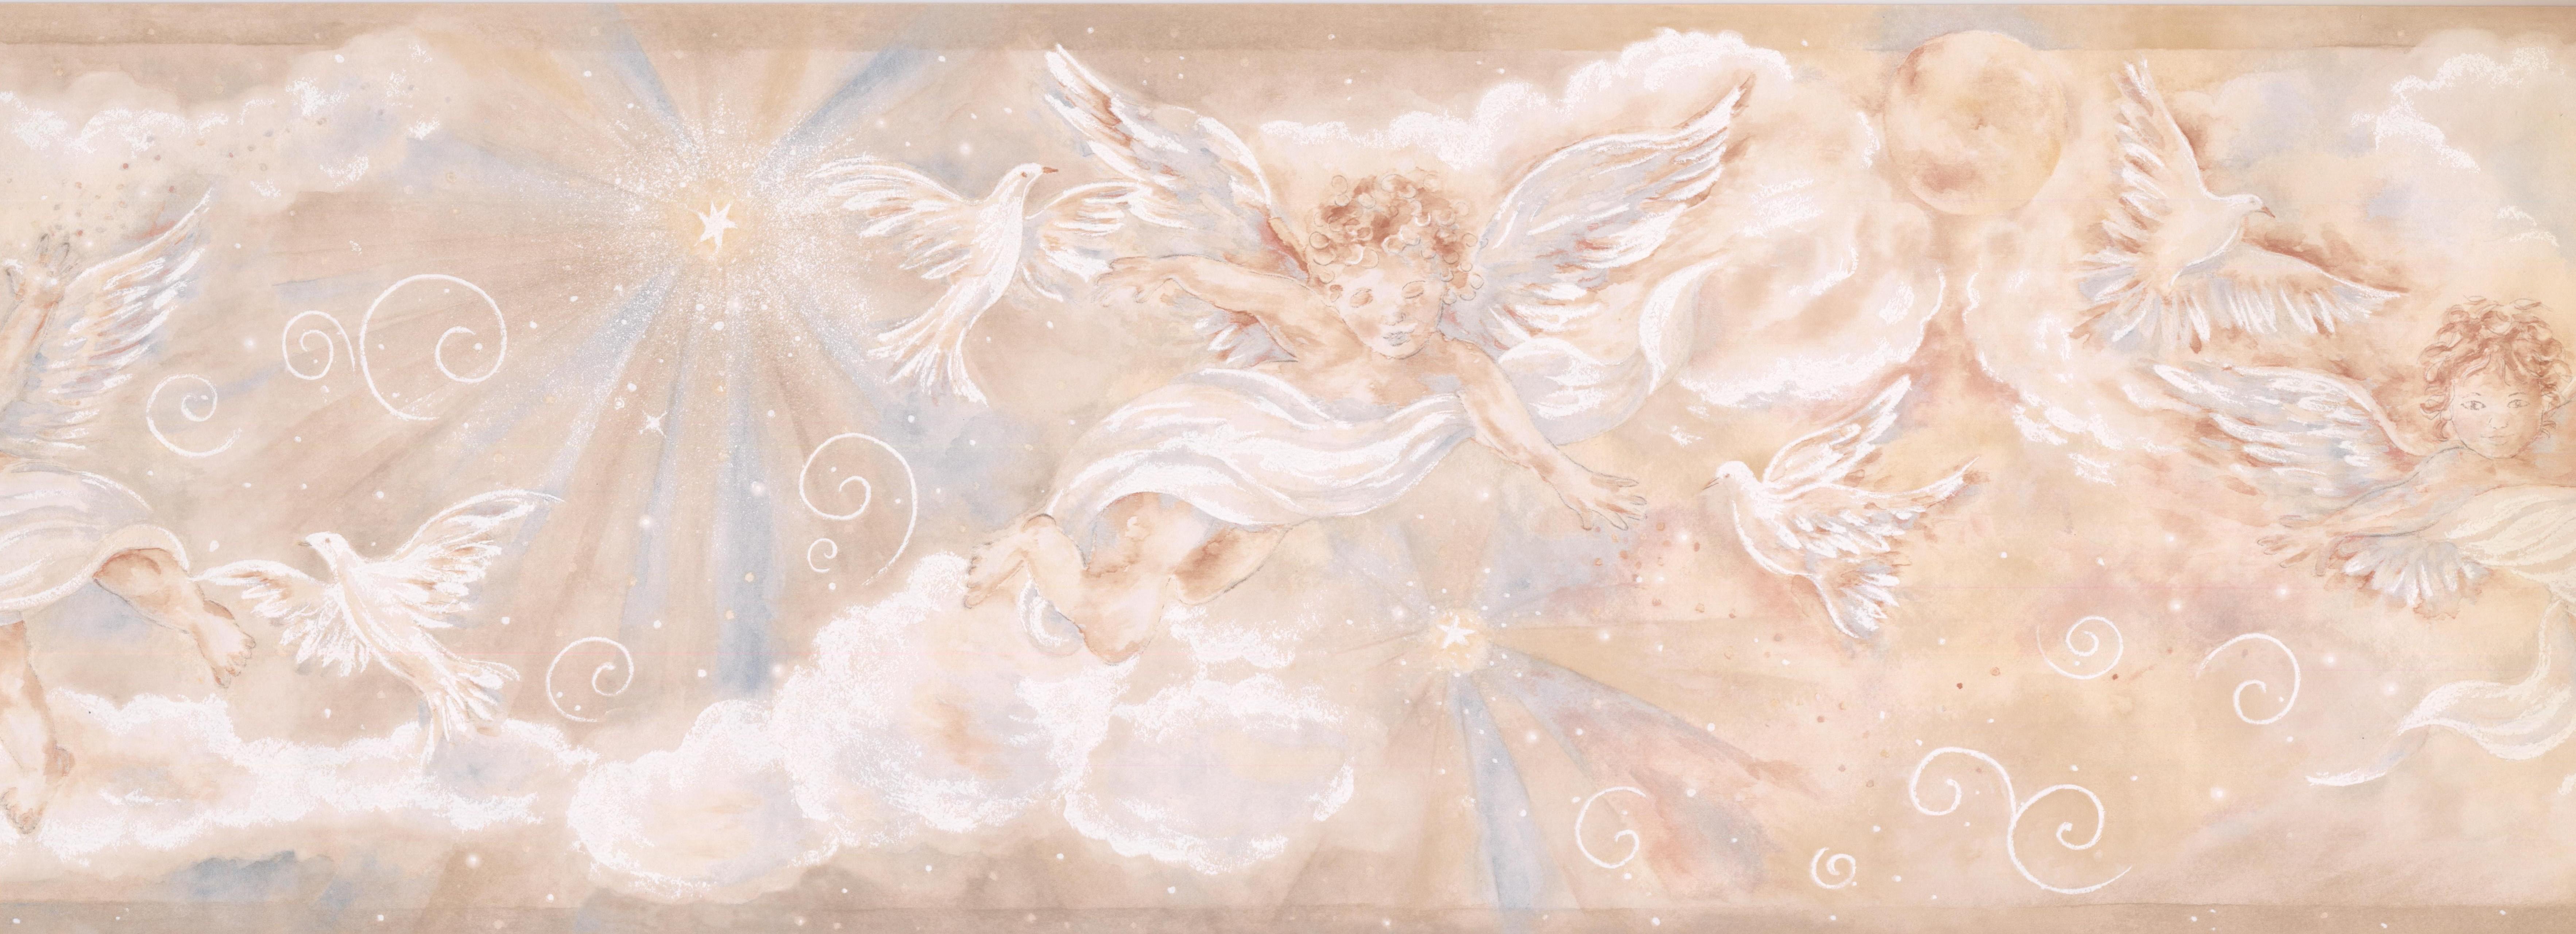 Beige Aesthetic Wallpaper Posted By John Cunningham